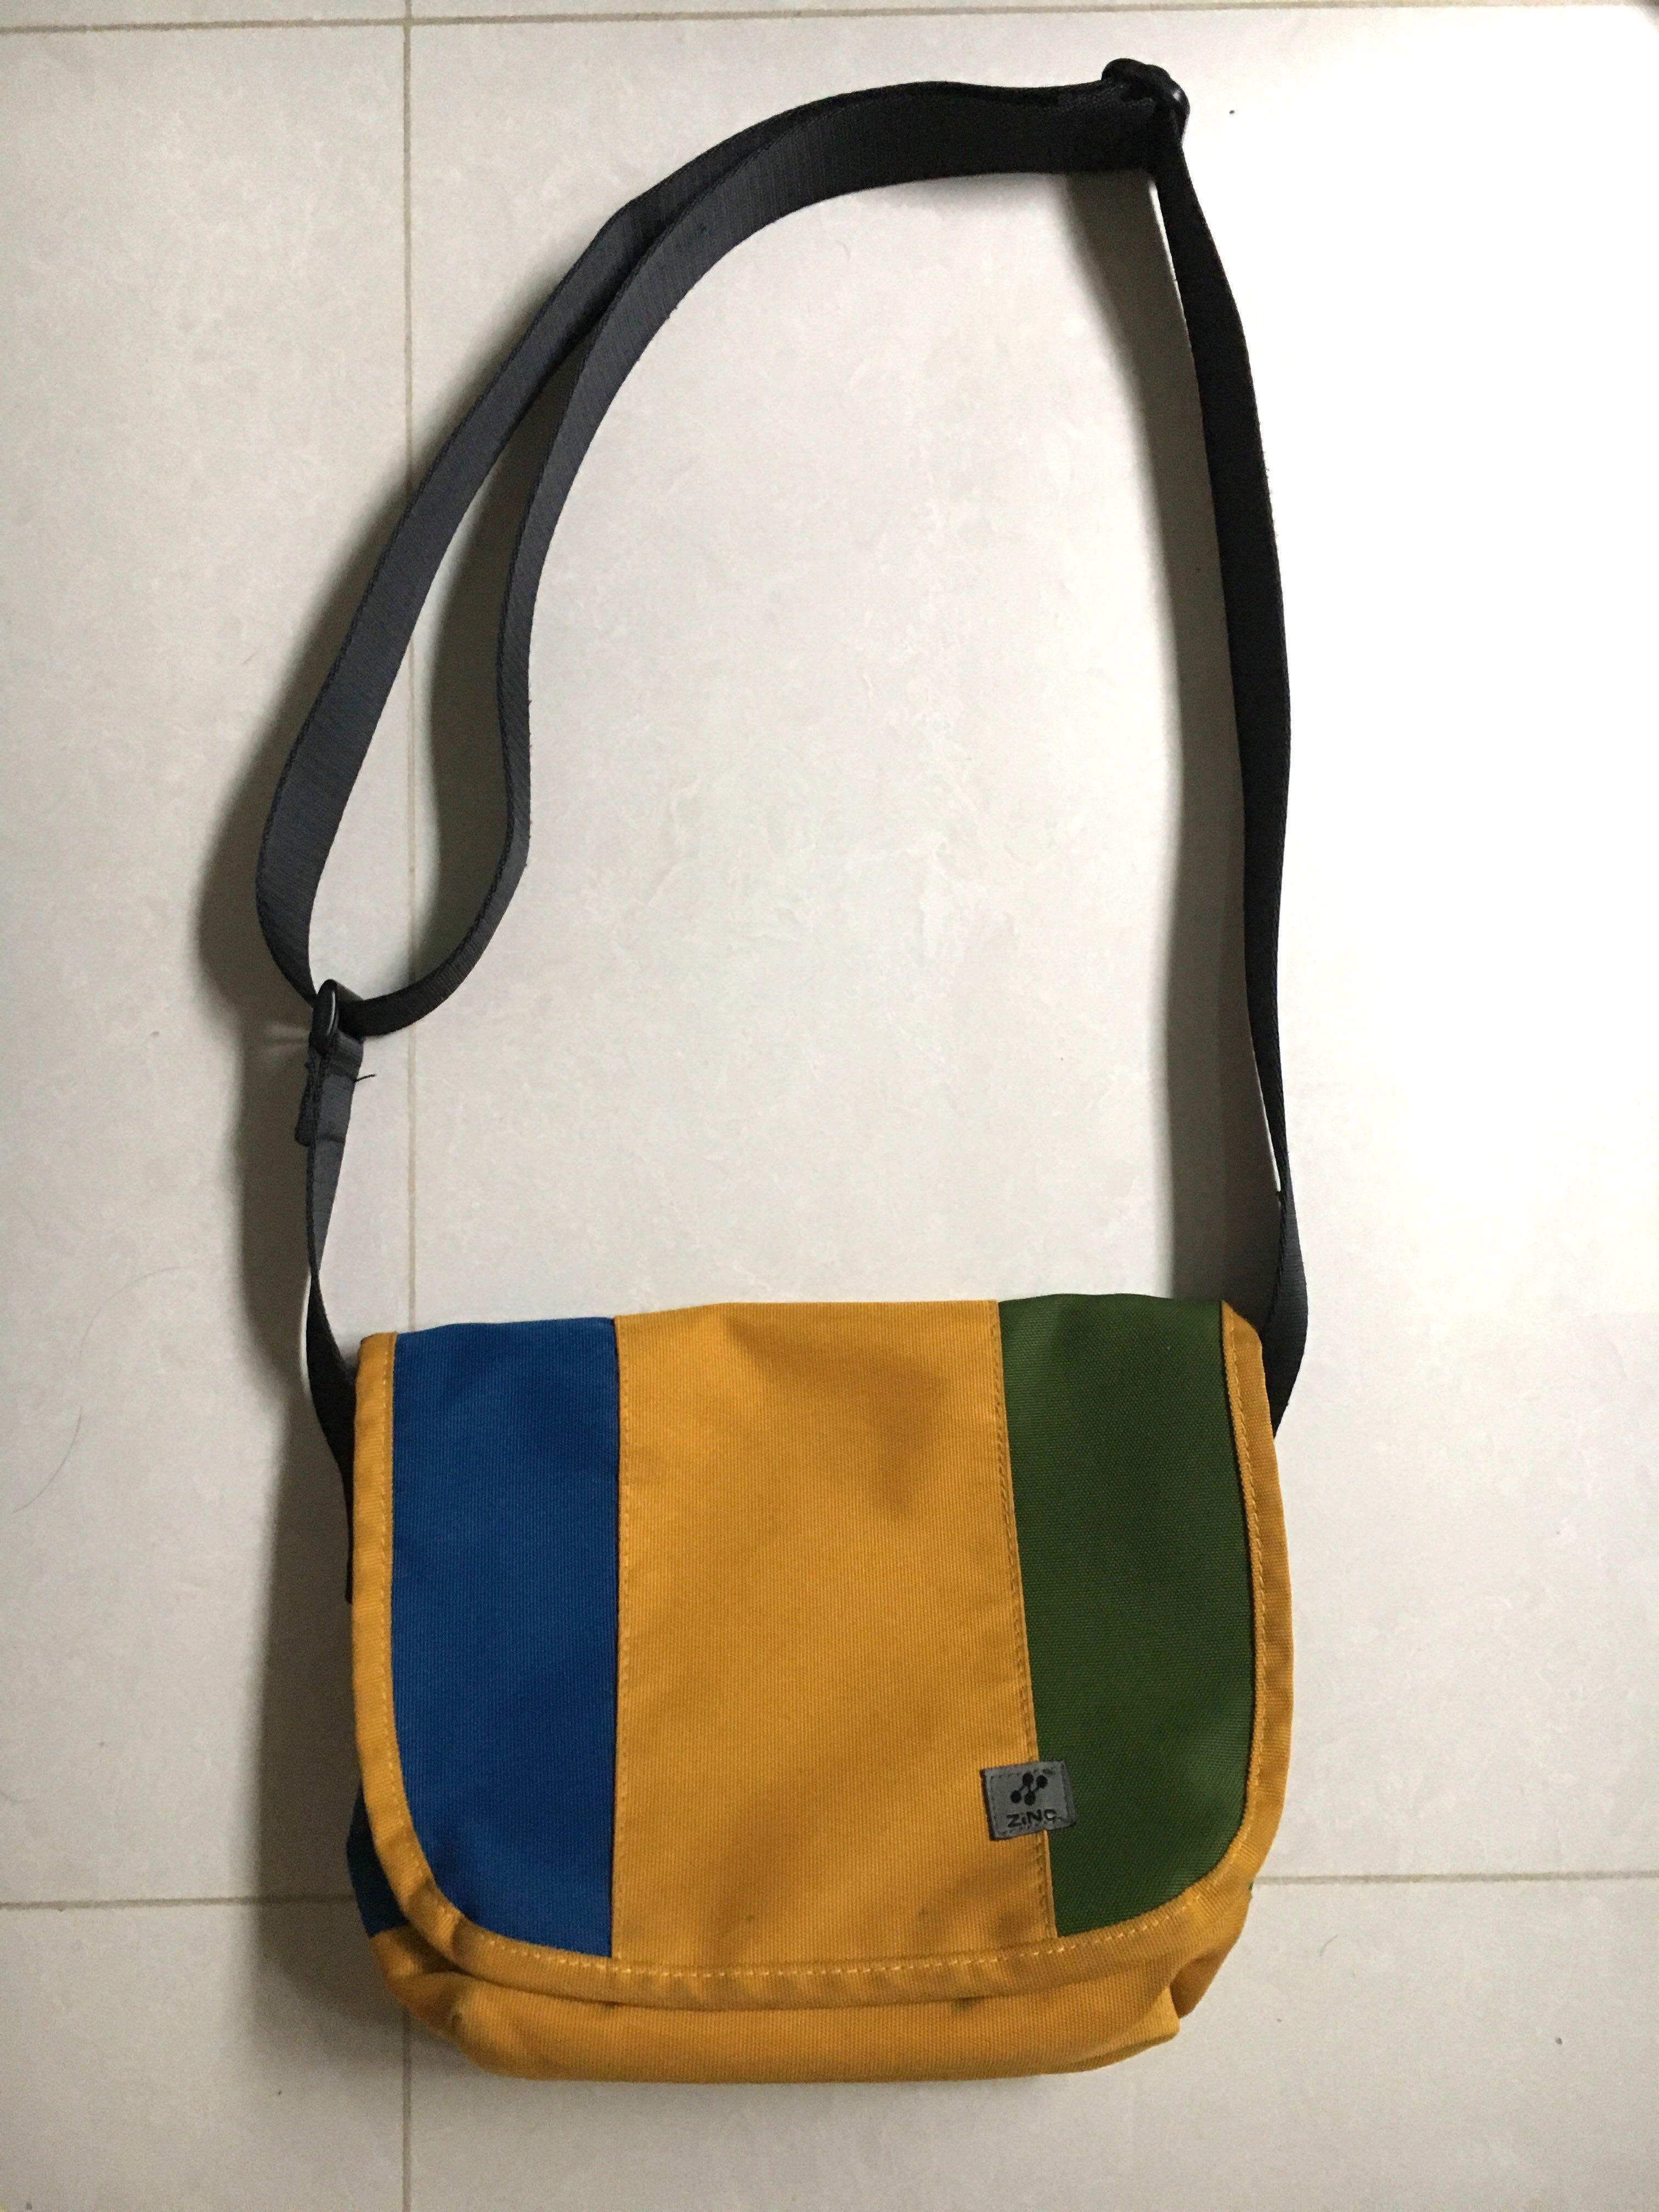 ed7fb2ce47 Home · Men s Fashion · Bags   Wallets · Sling Bags. photo photo photo photo